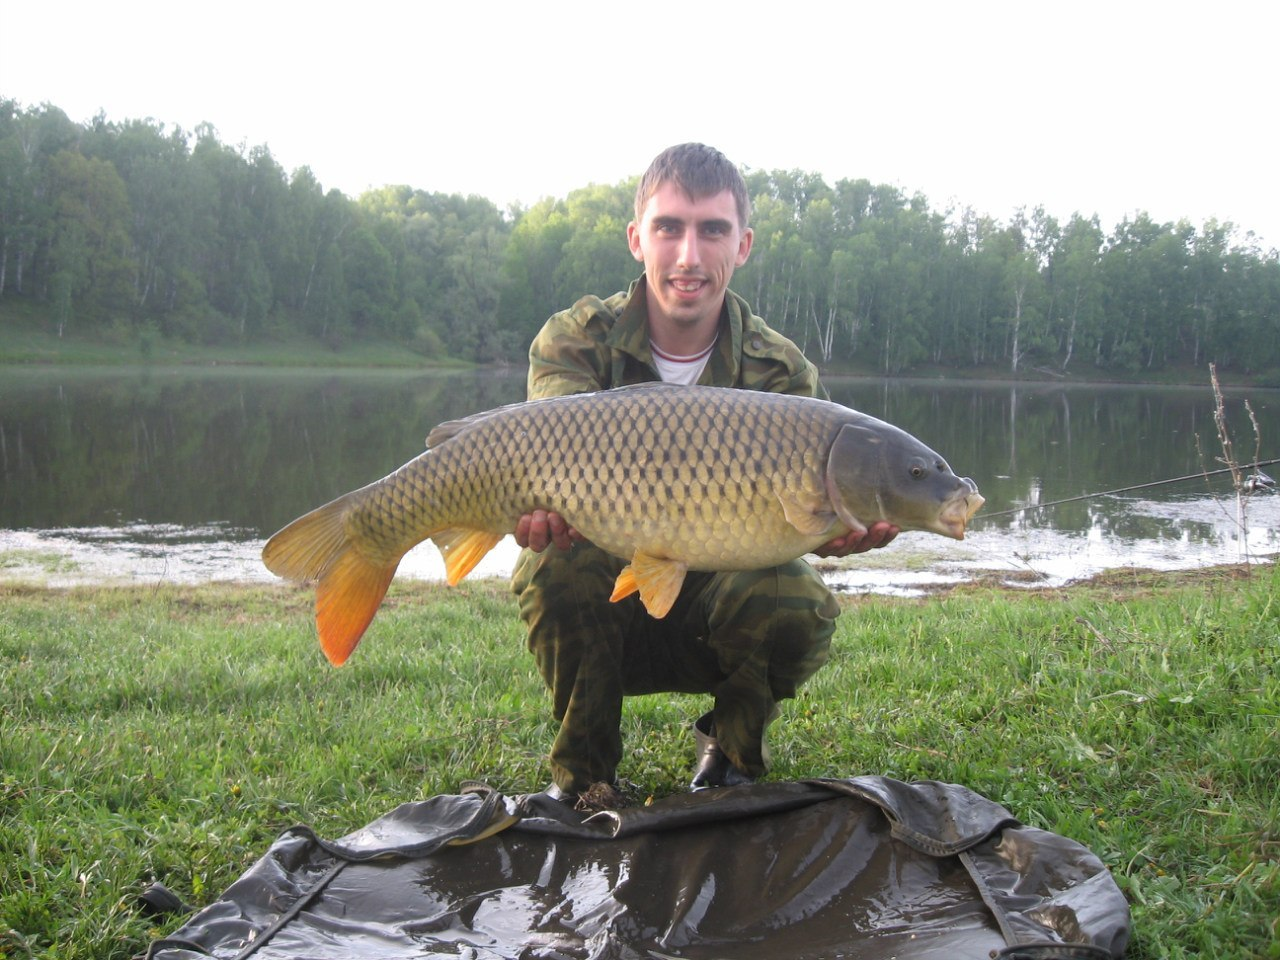 димитровград река рыбалка